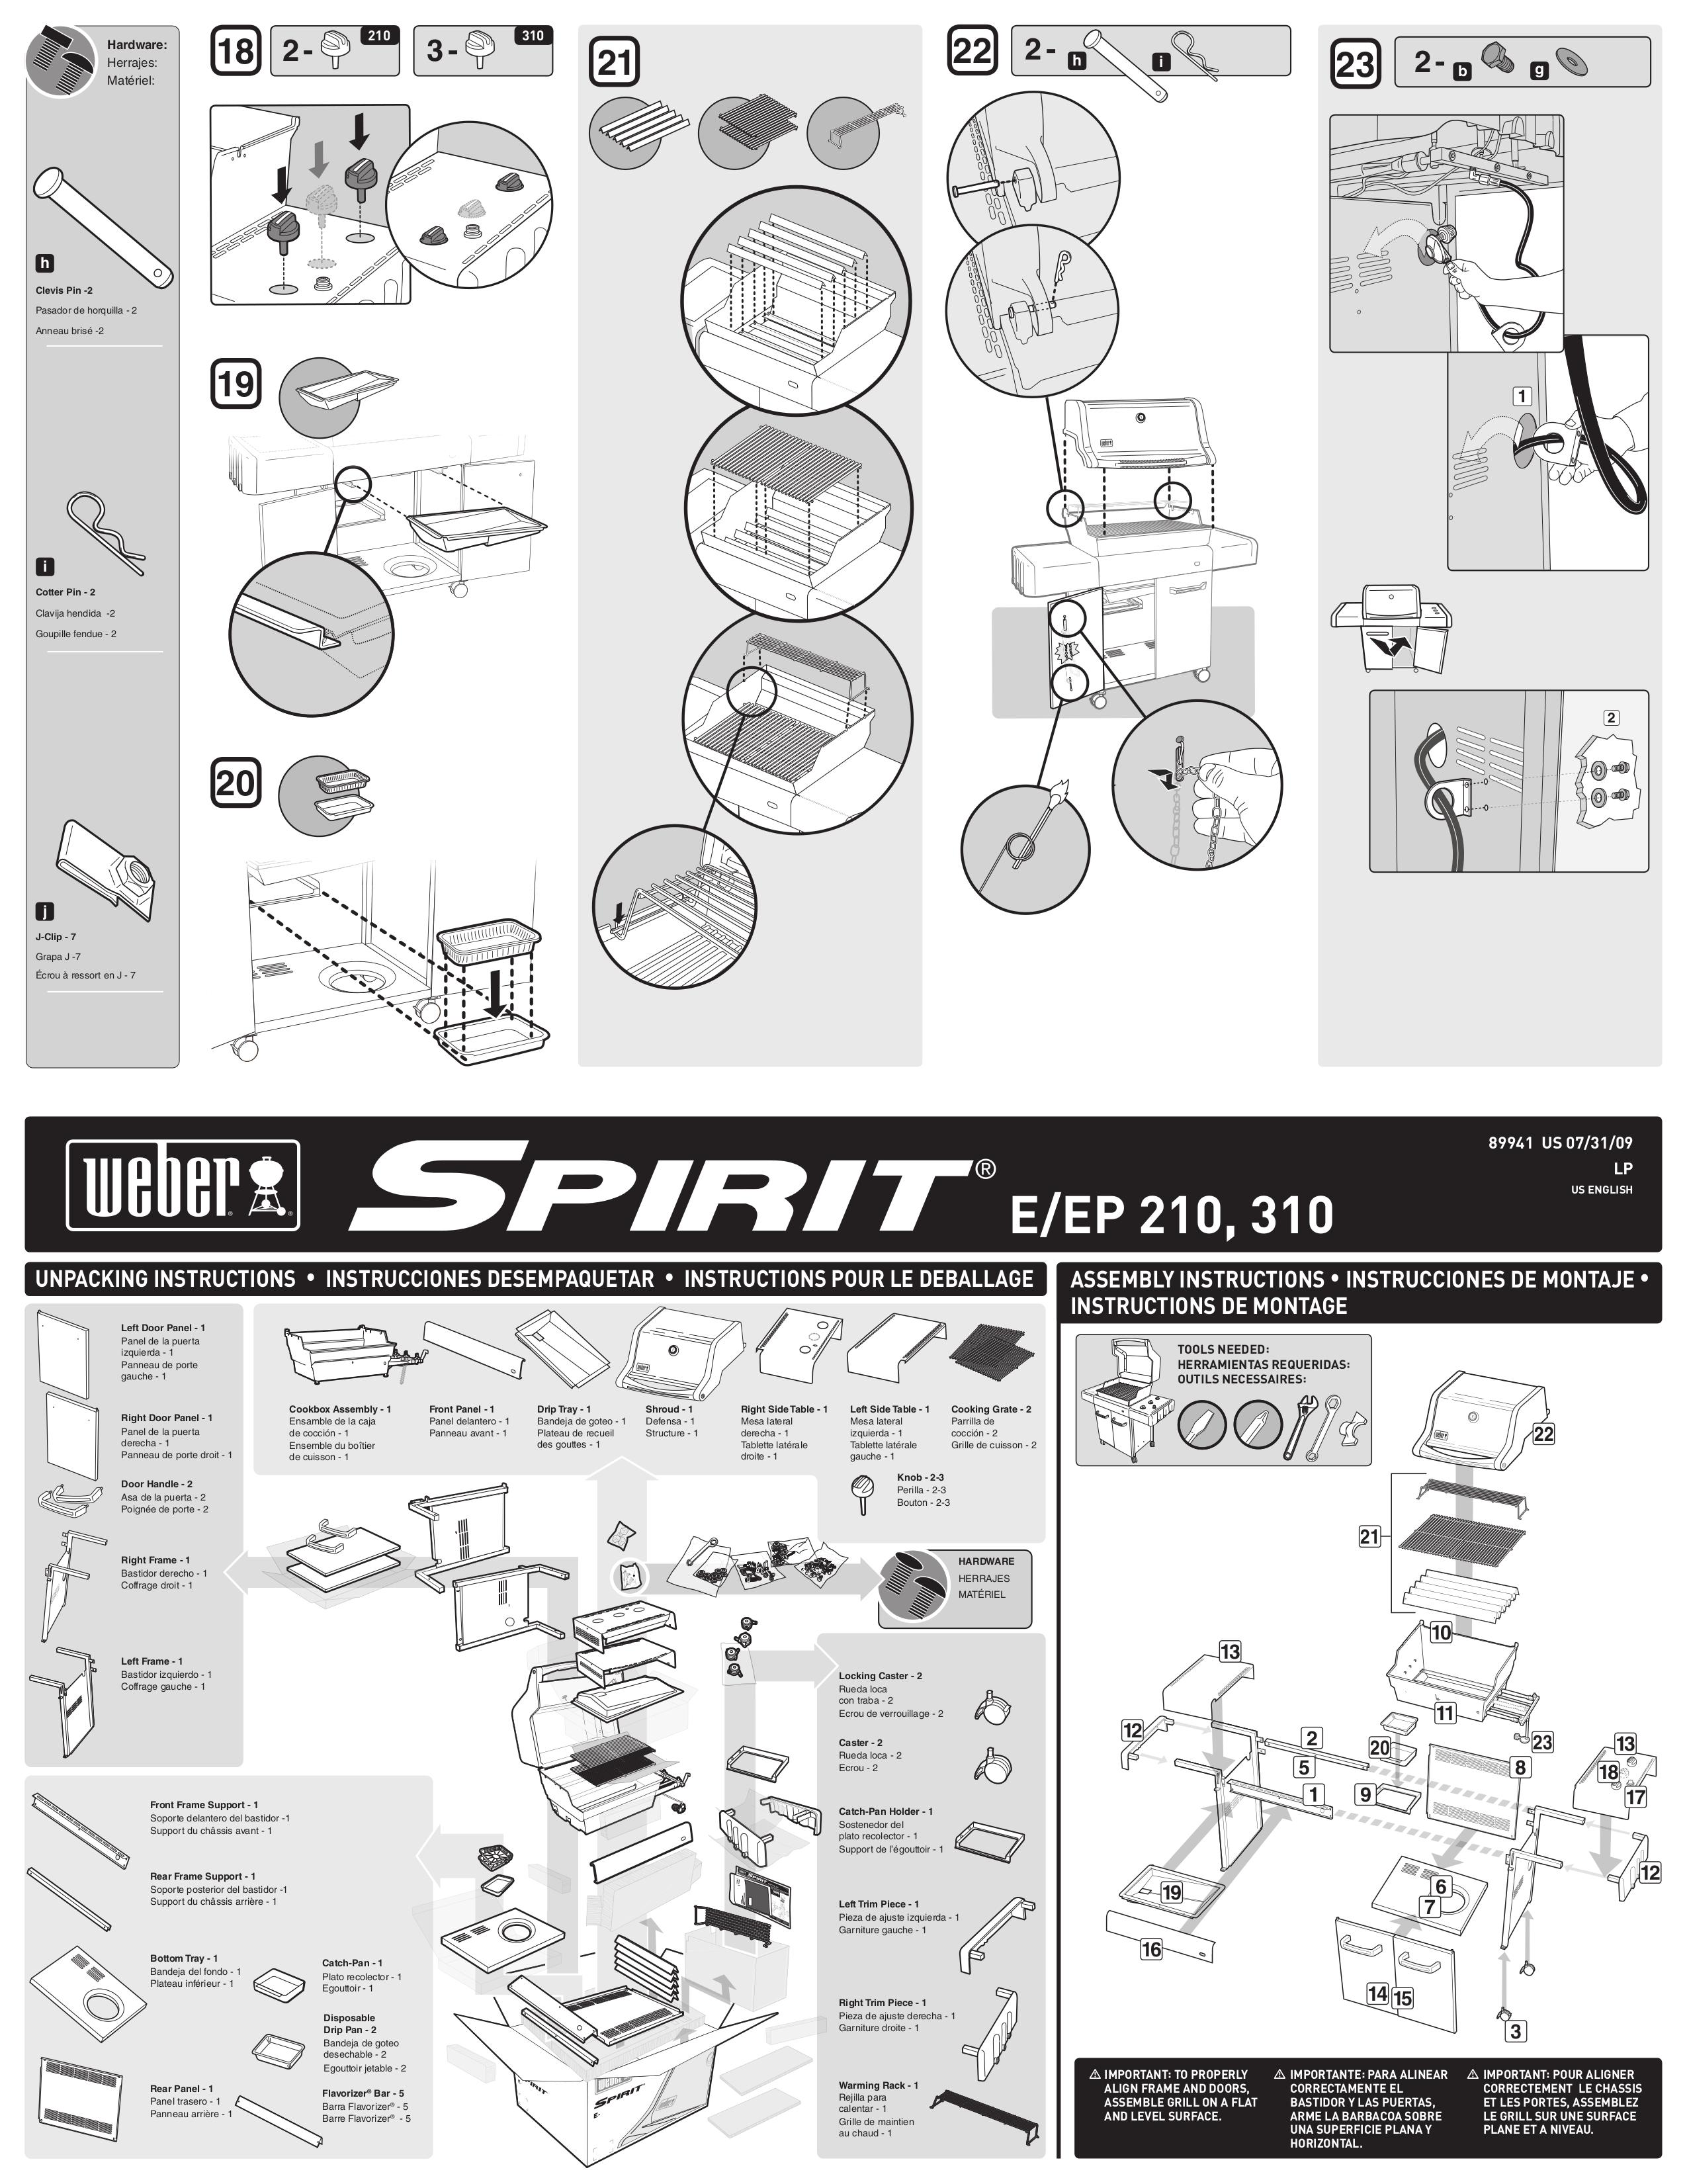 Weber spirit e310 classic manuals.